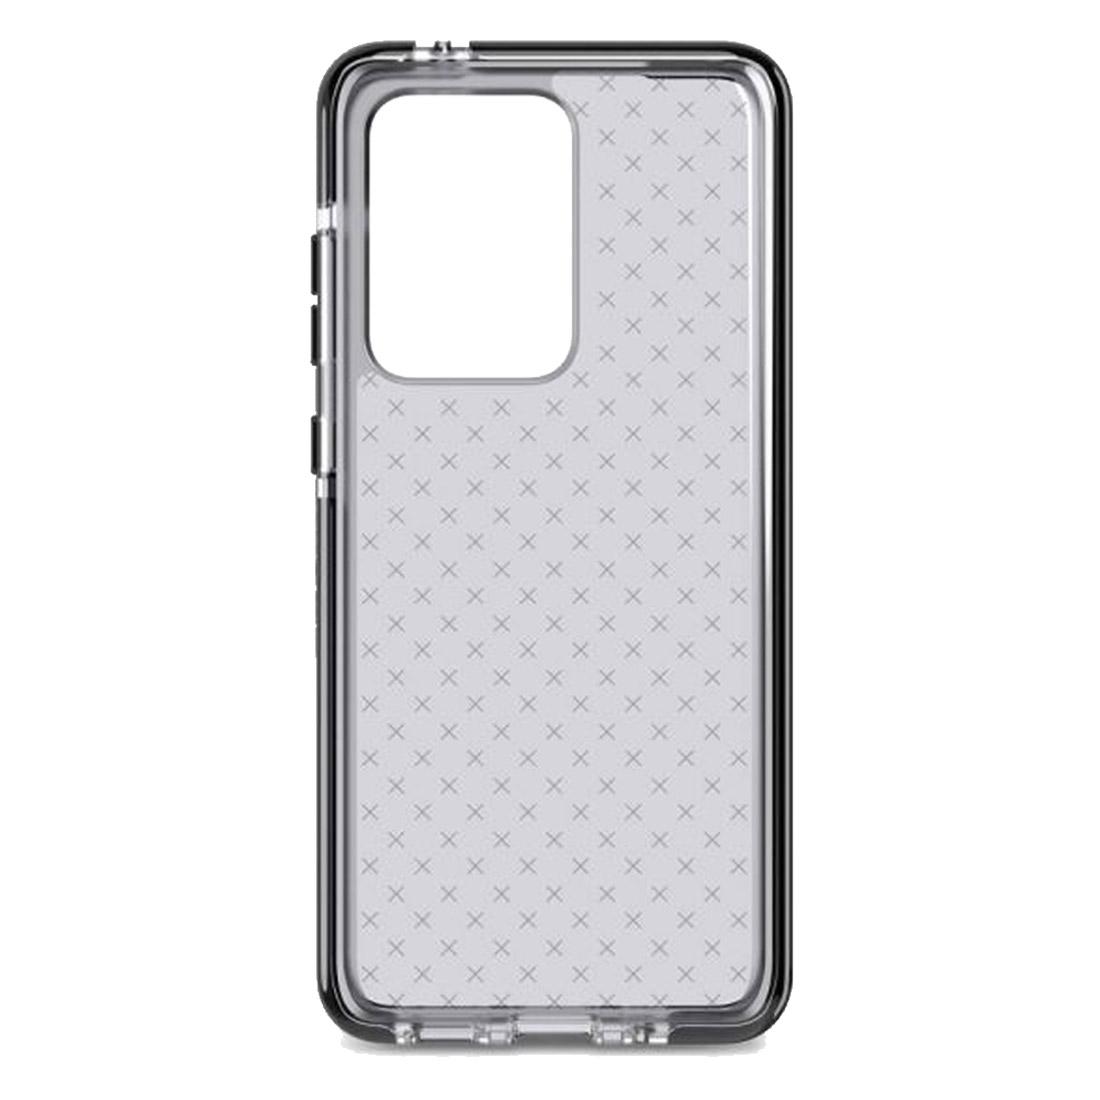 Tech21 Evo Check Case for Samsung Galaxy S20 Ultra T21-7701 - Smokey Black